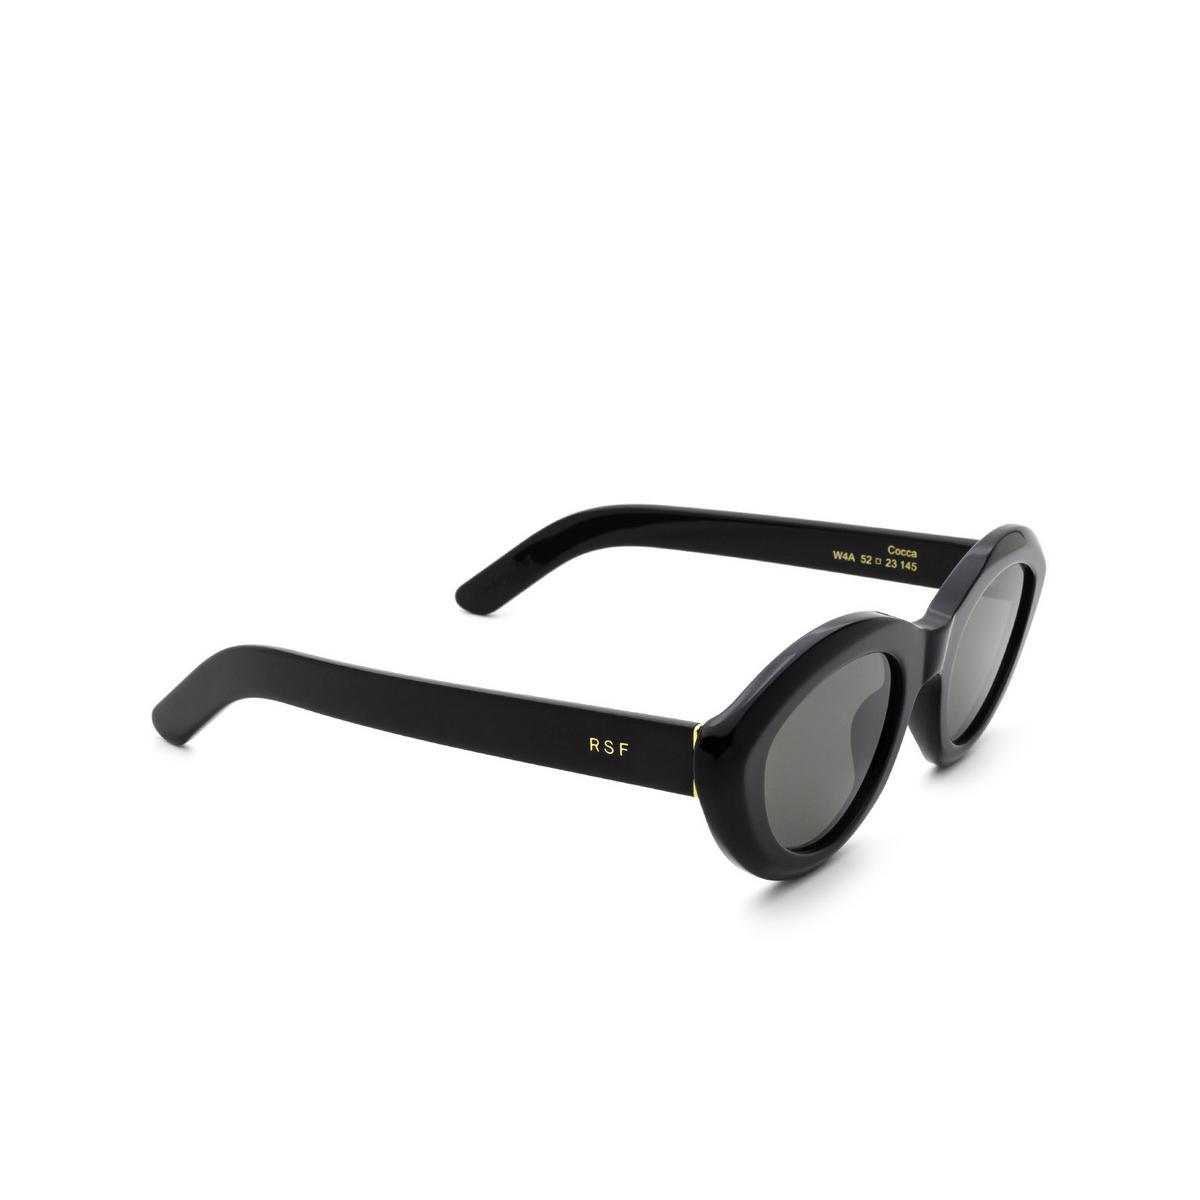 Retrosuperfuture® Cat-eye Sunglasses: Cocca color Black W4A - three-quarters view.